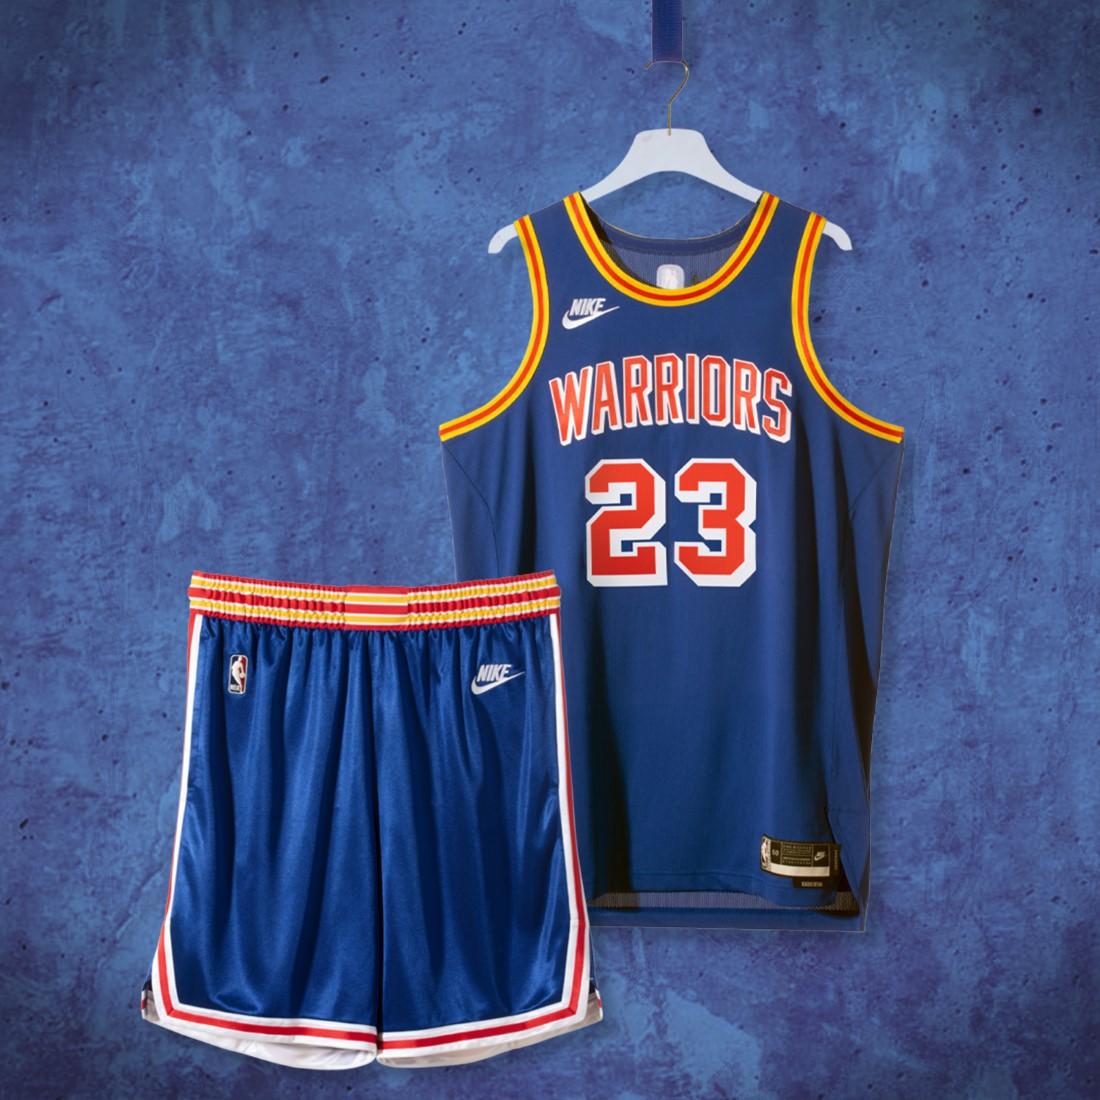 Nike x NBA 75 Anniversaire - Golden State Warriors